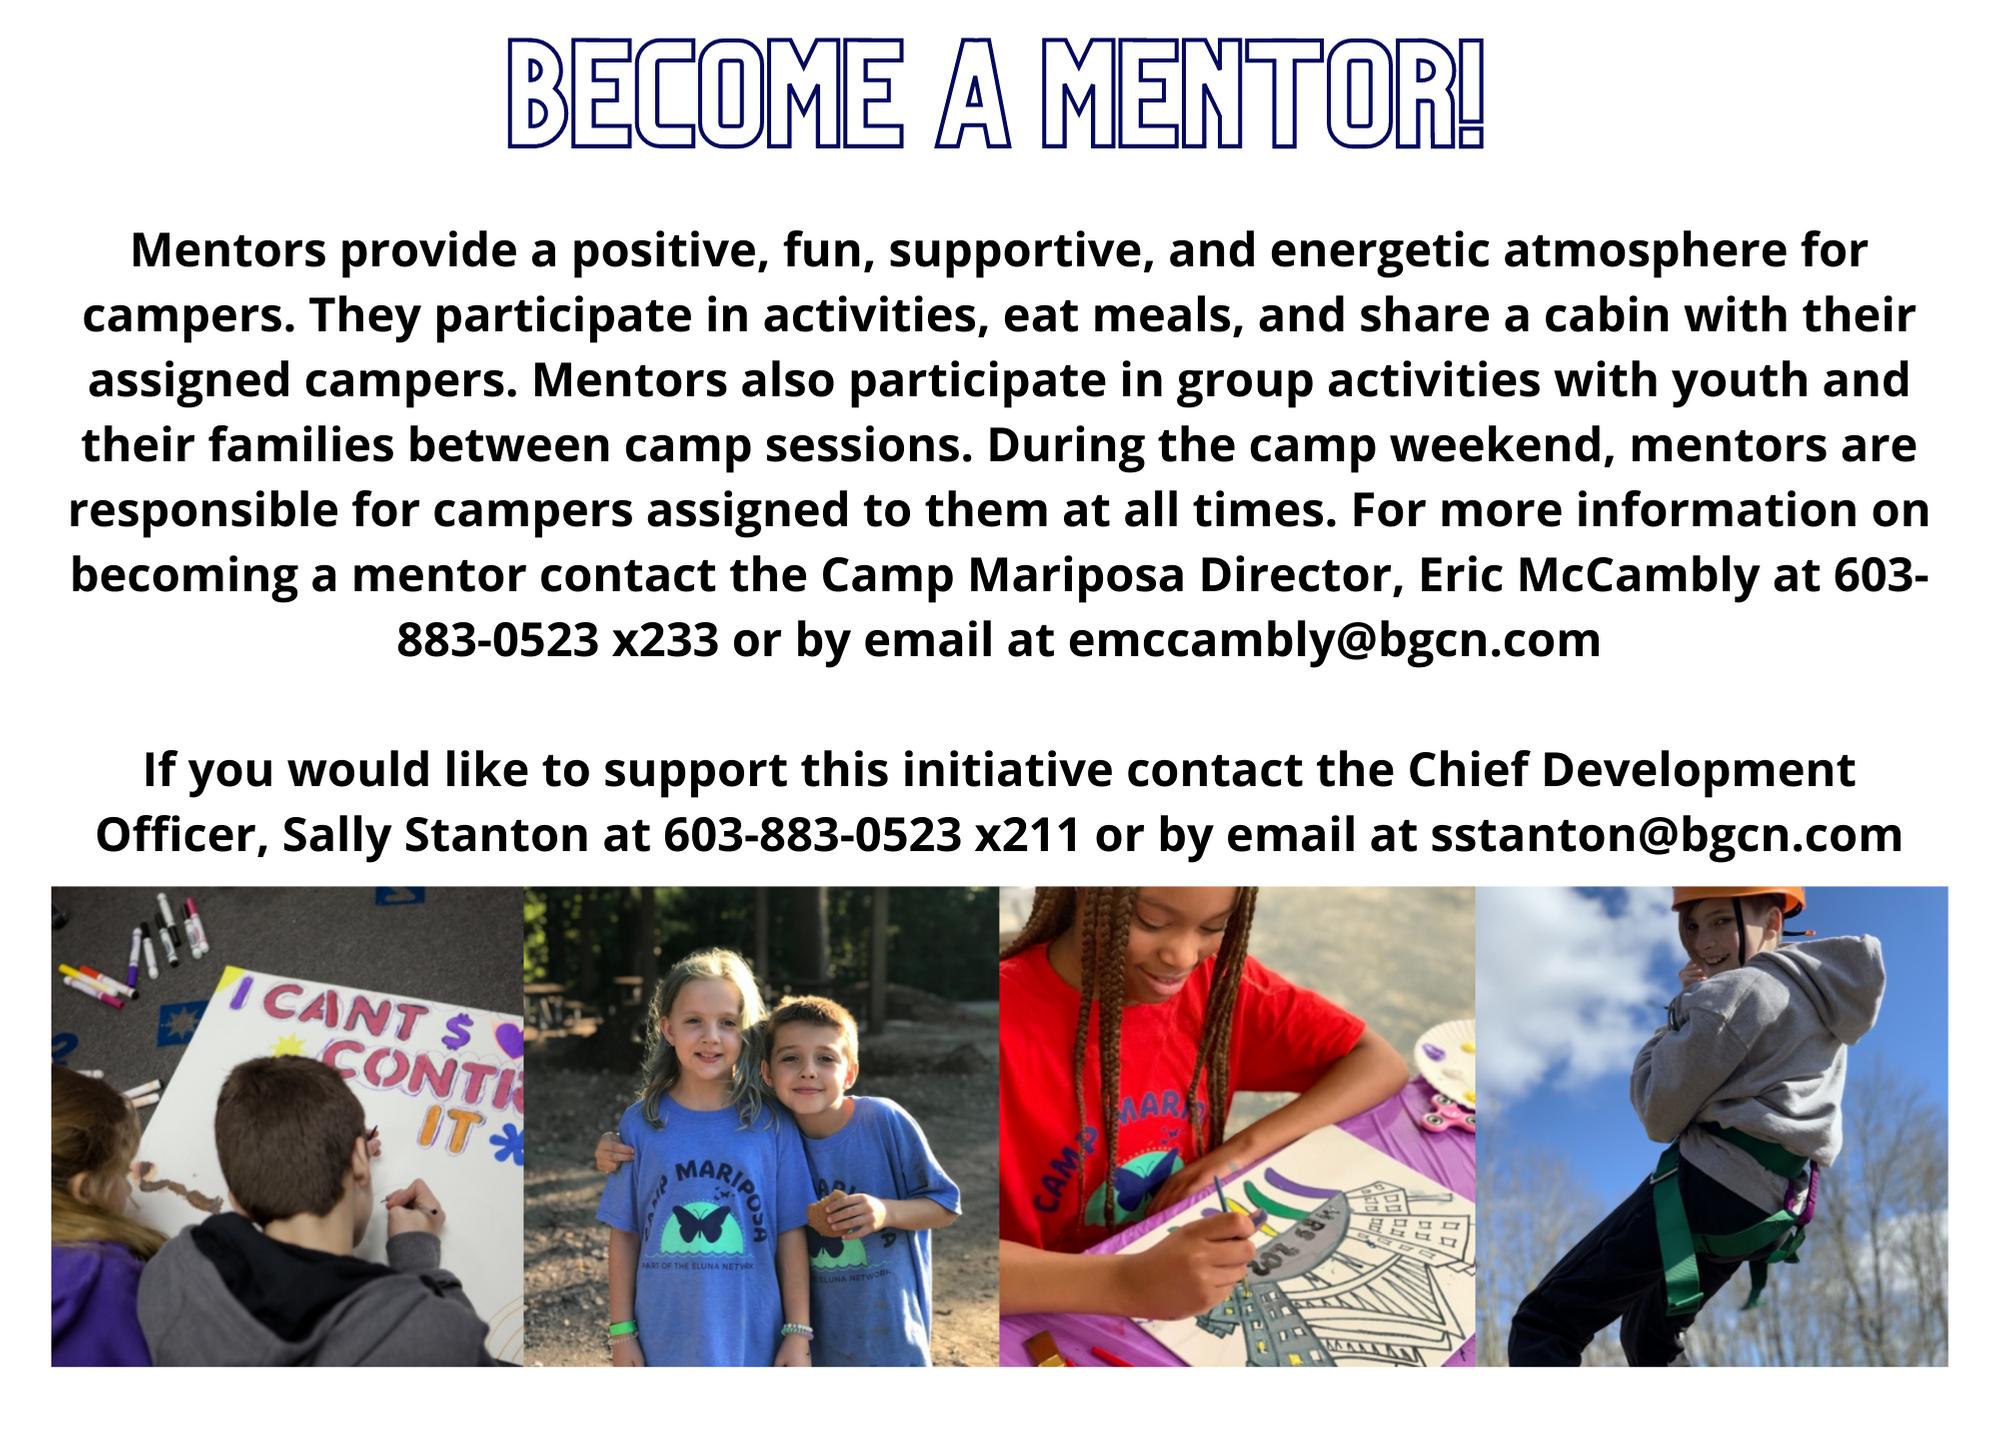 Camp-Mariposa_become-a-mentor-741x1024